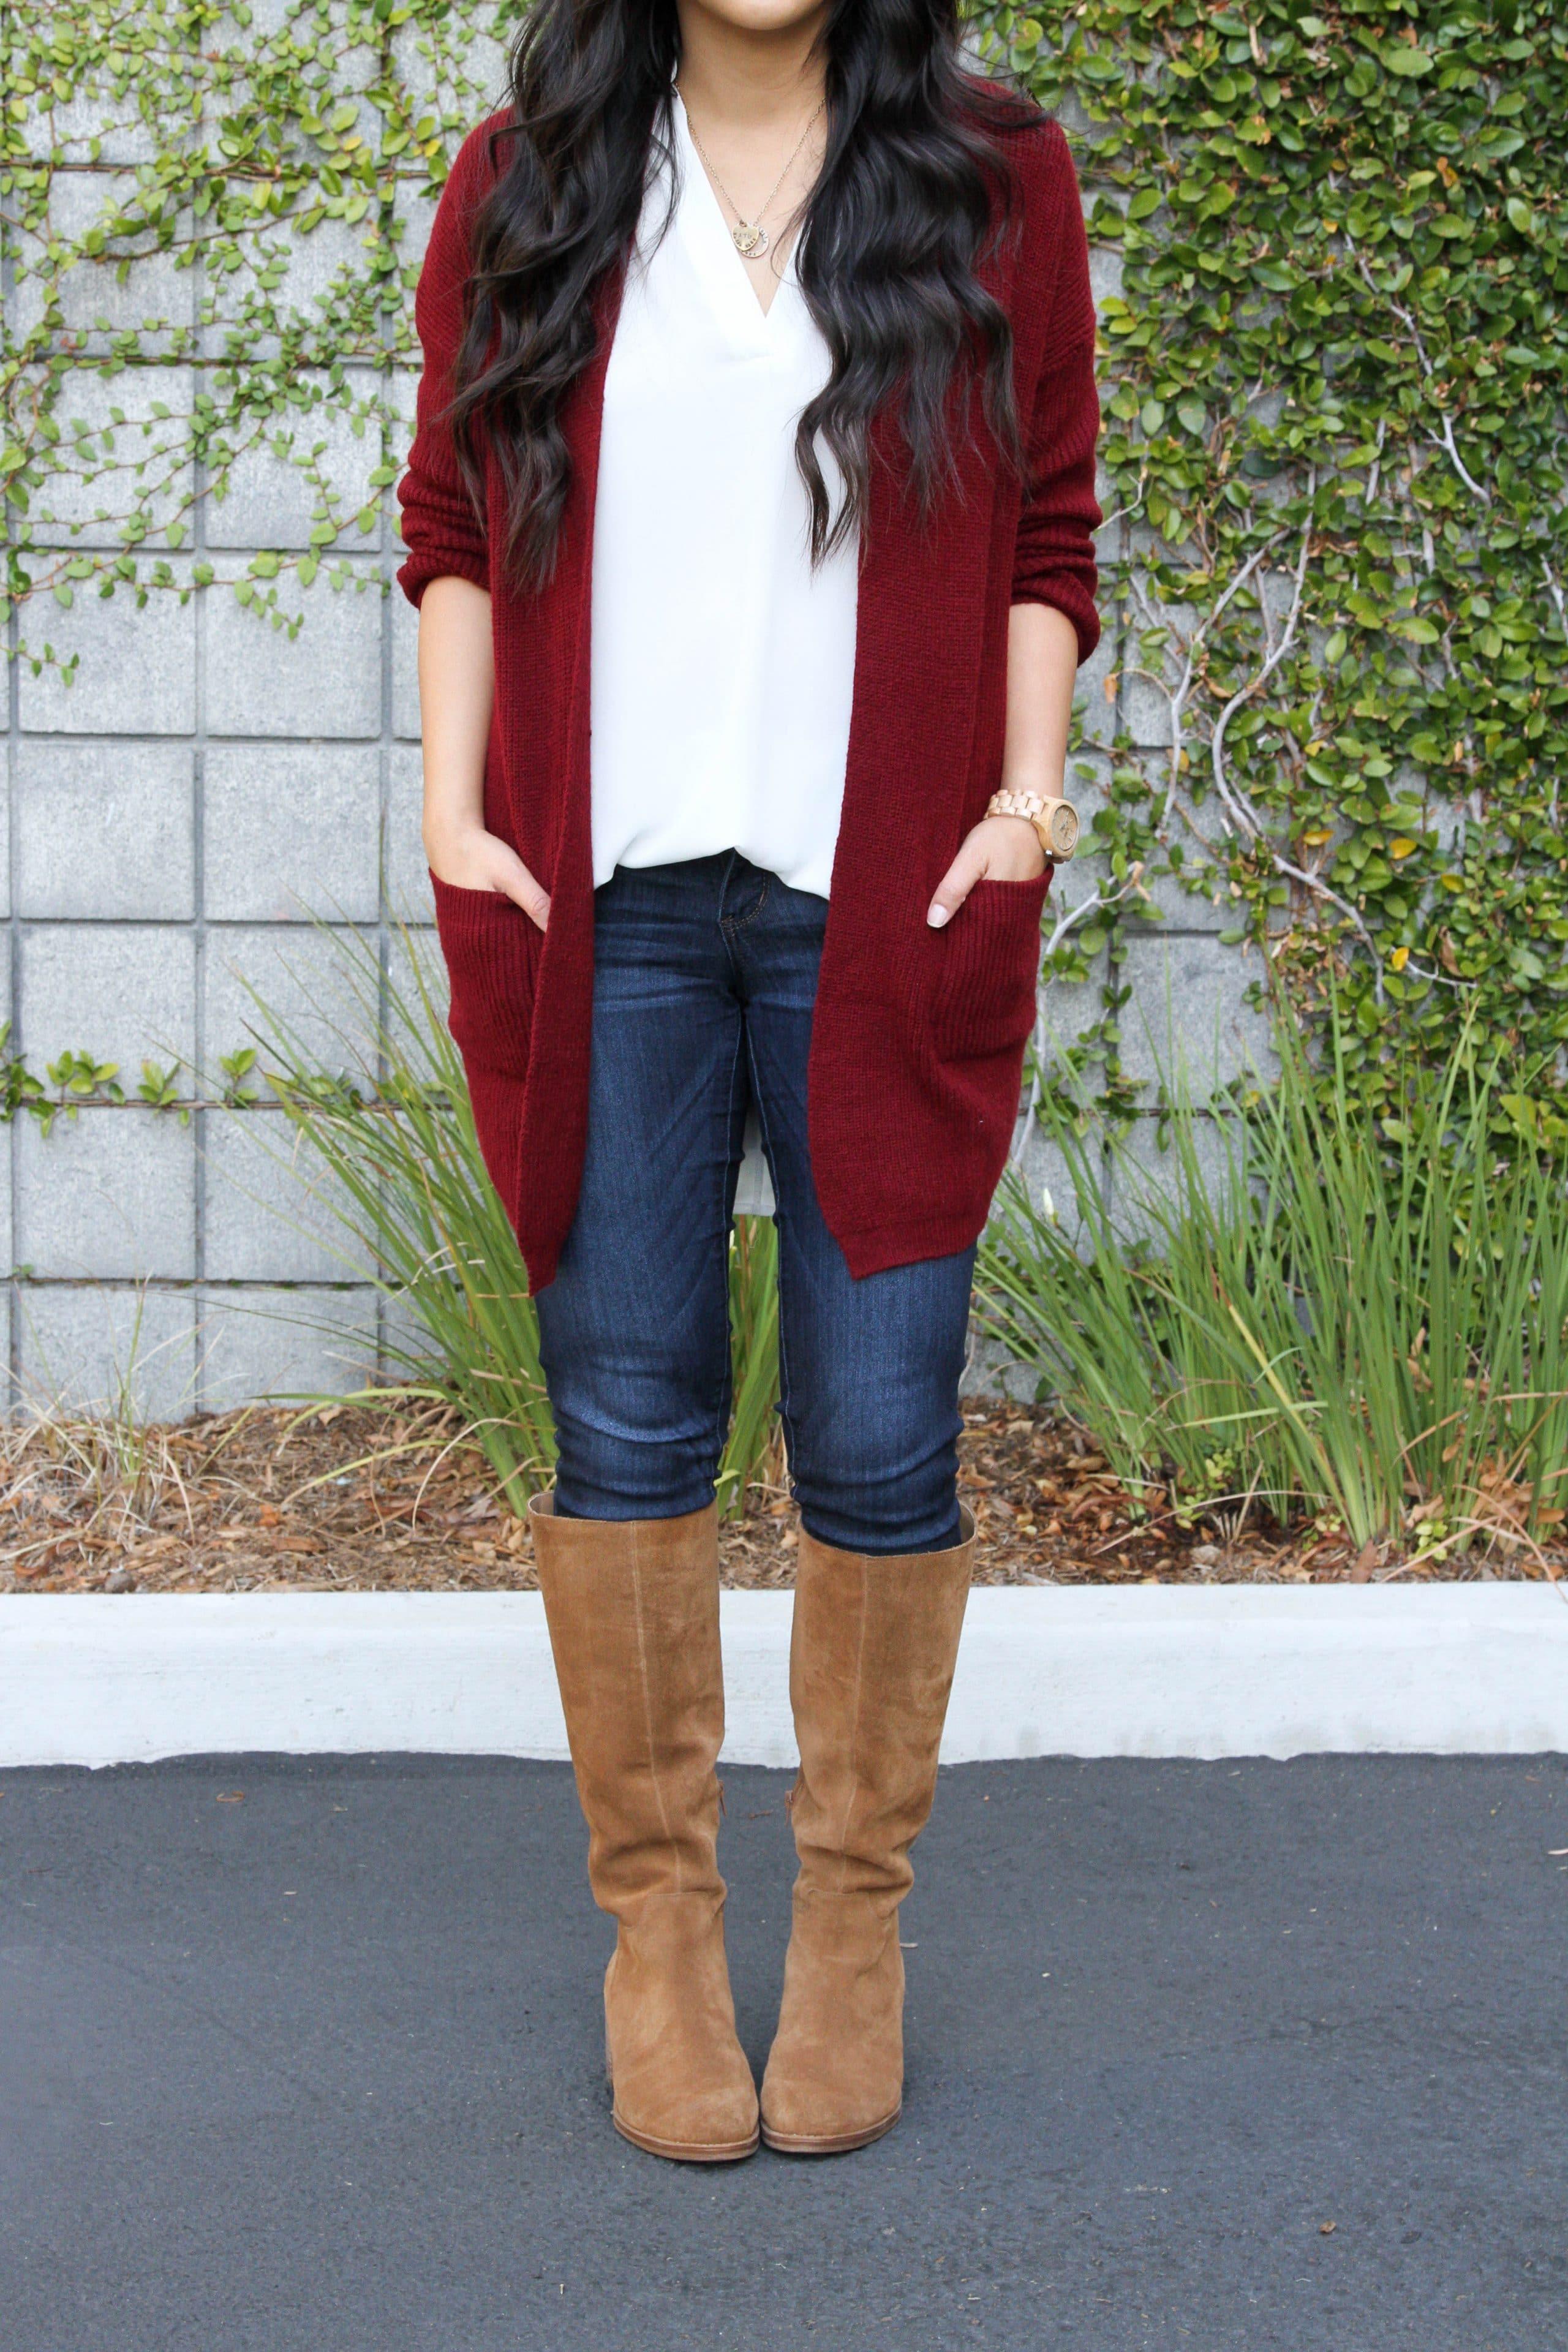 Skinnies + Lush tunic + Maroon Cardigan + Boots